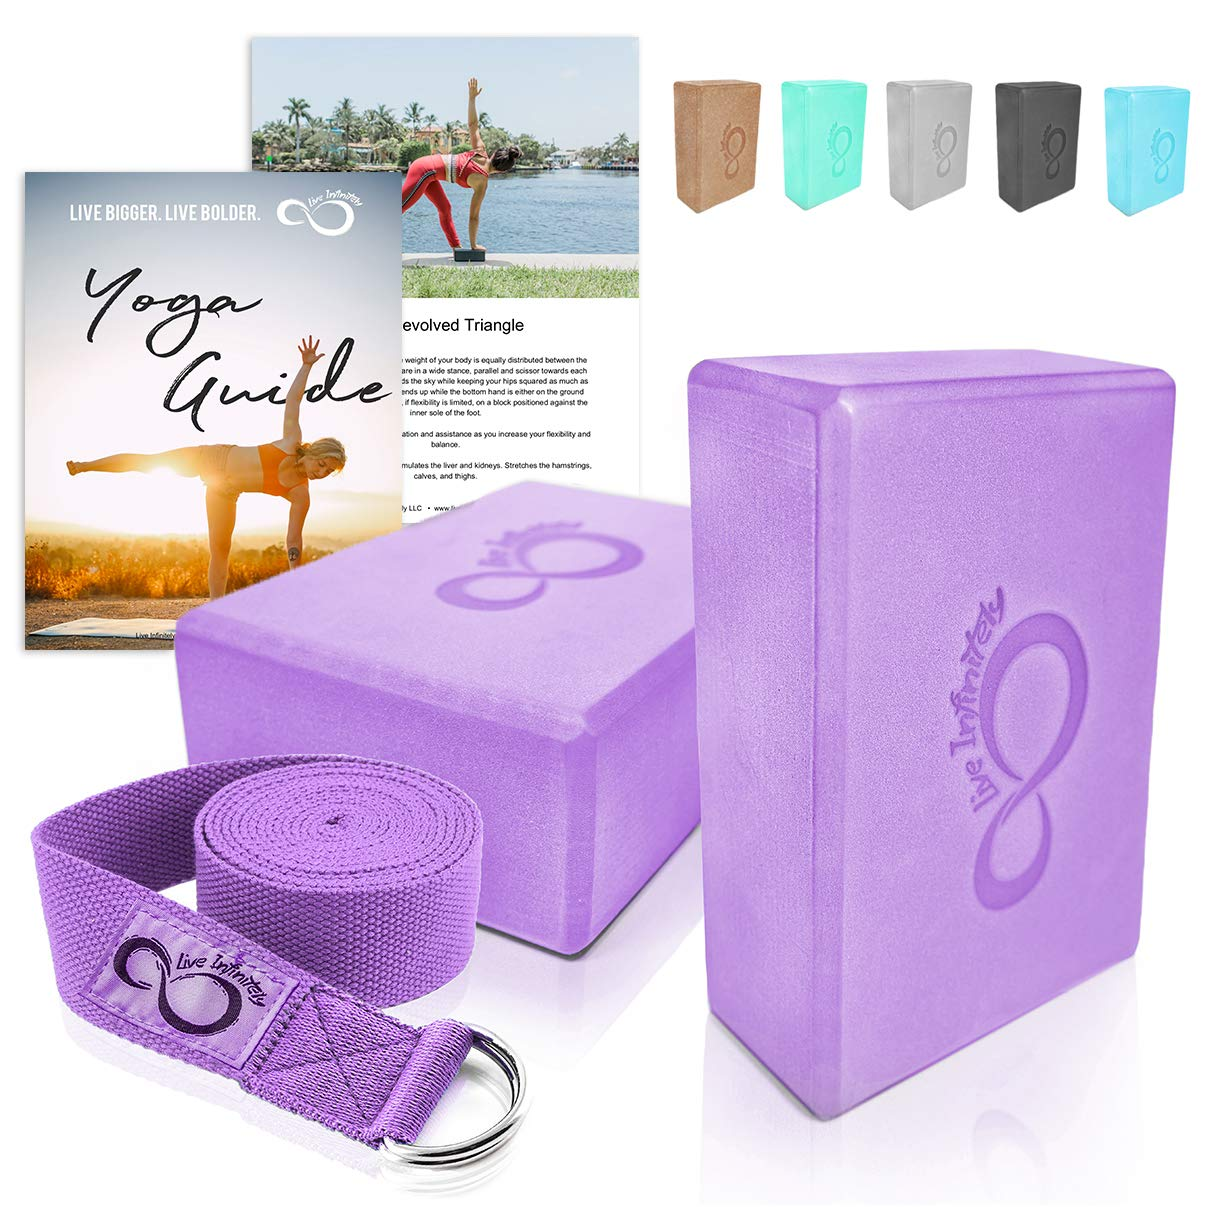 Premium Yoga Blocks & Metal D Ring Strap Yogi Set (3PC)